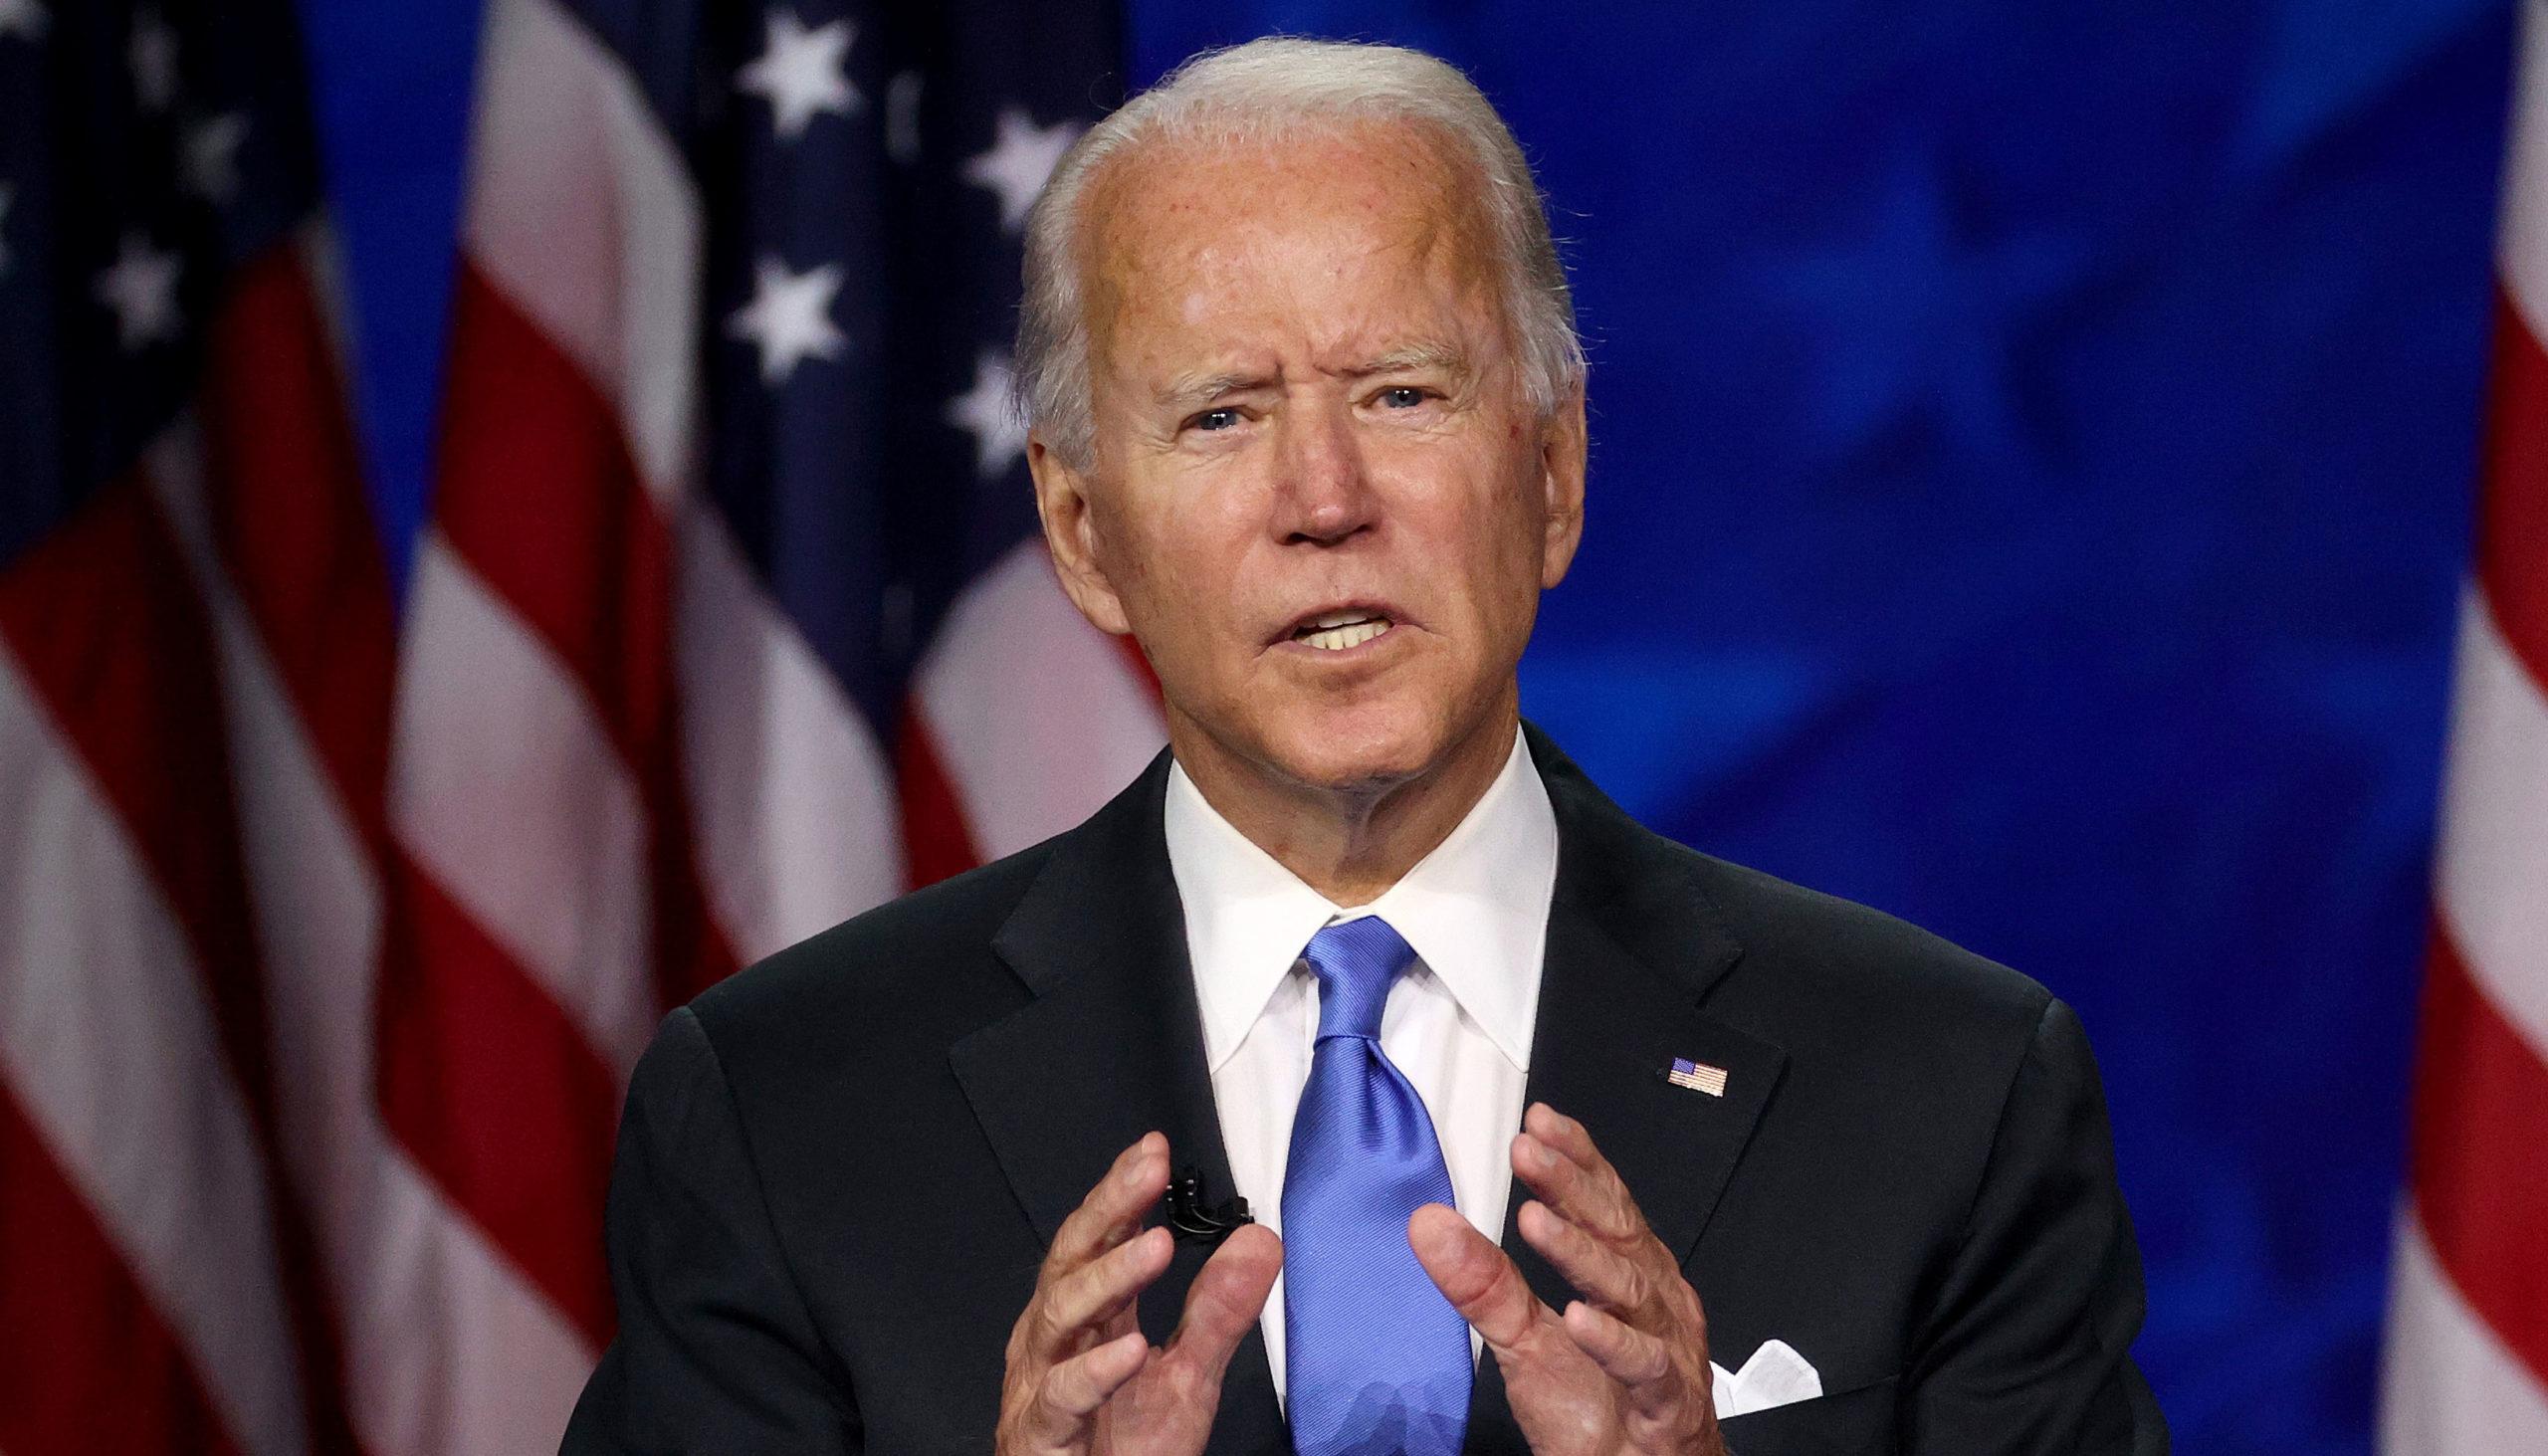 Next US President odds: Biden heavy favourite for White House